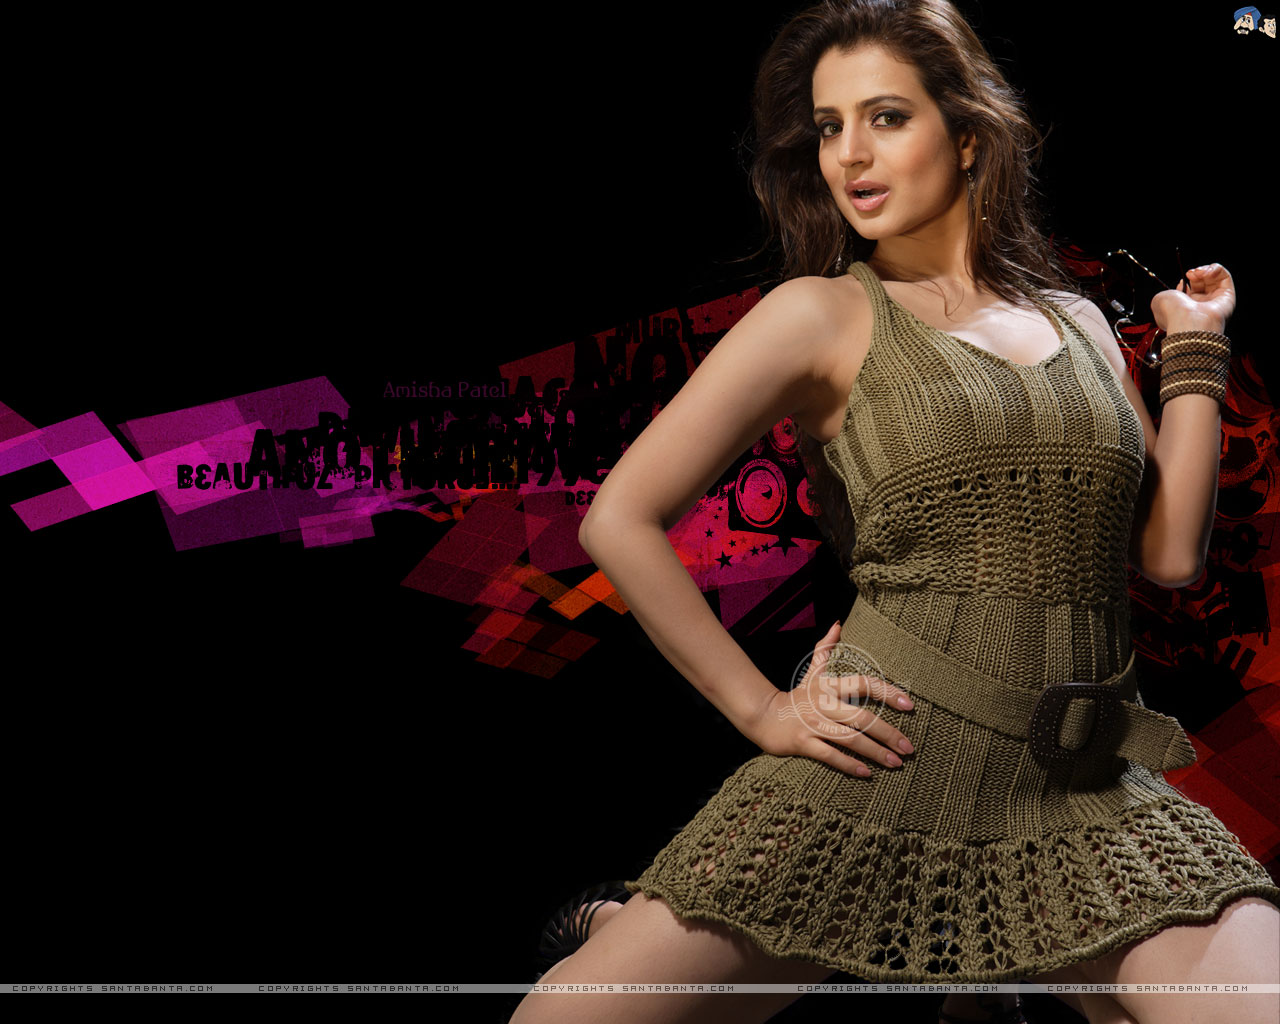 Nonarian: Hot Amisha Patel